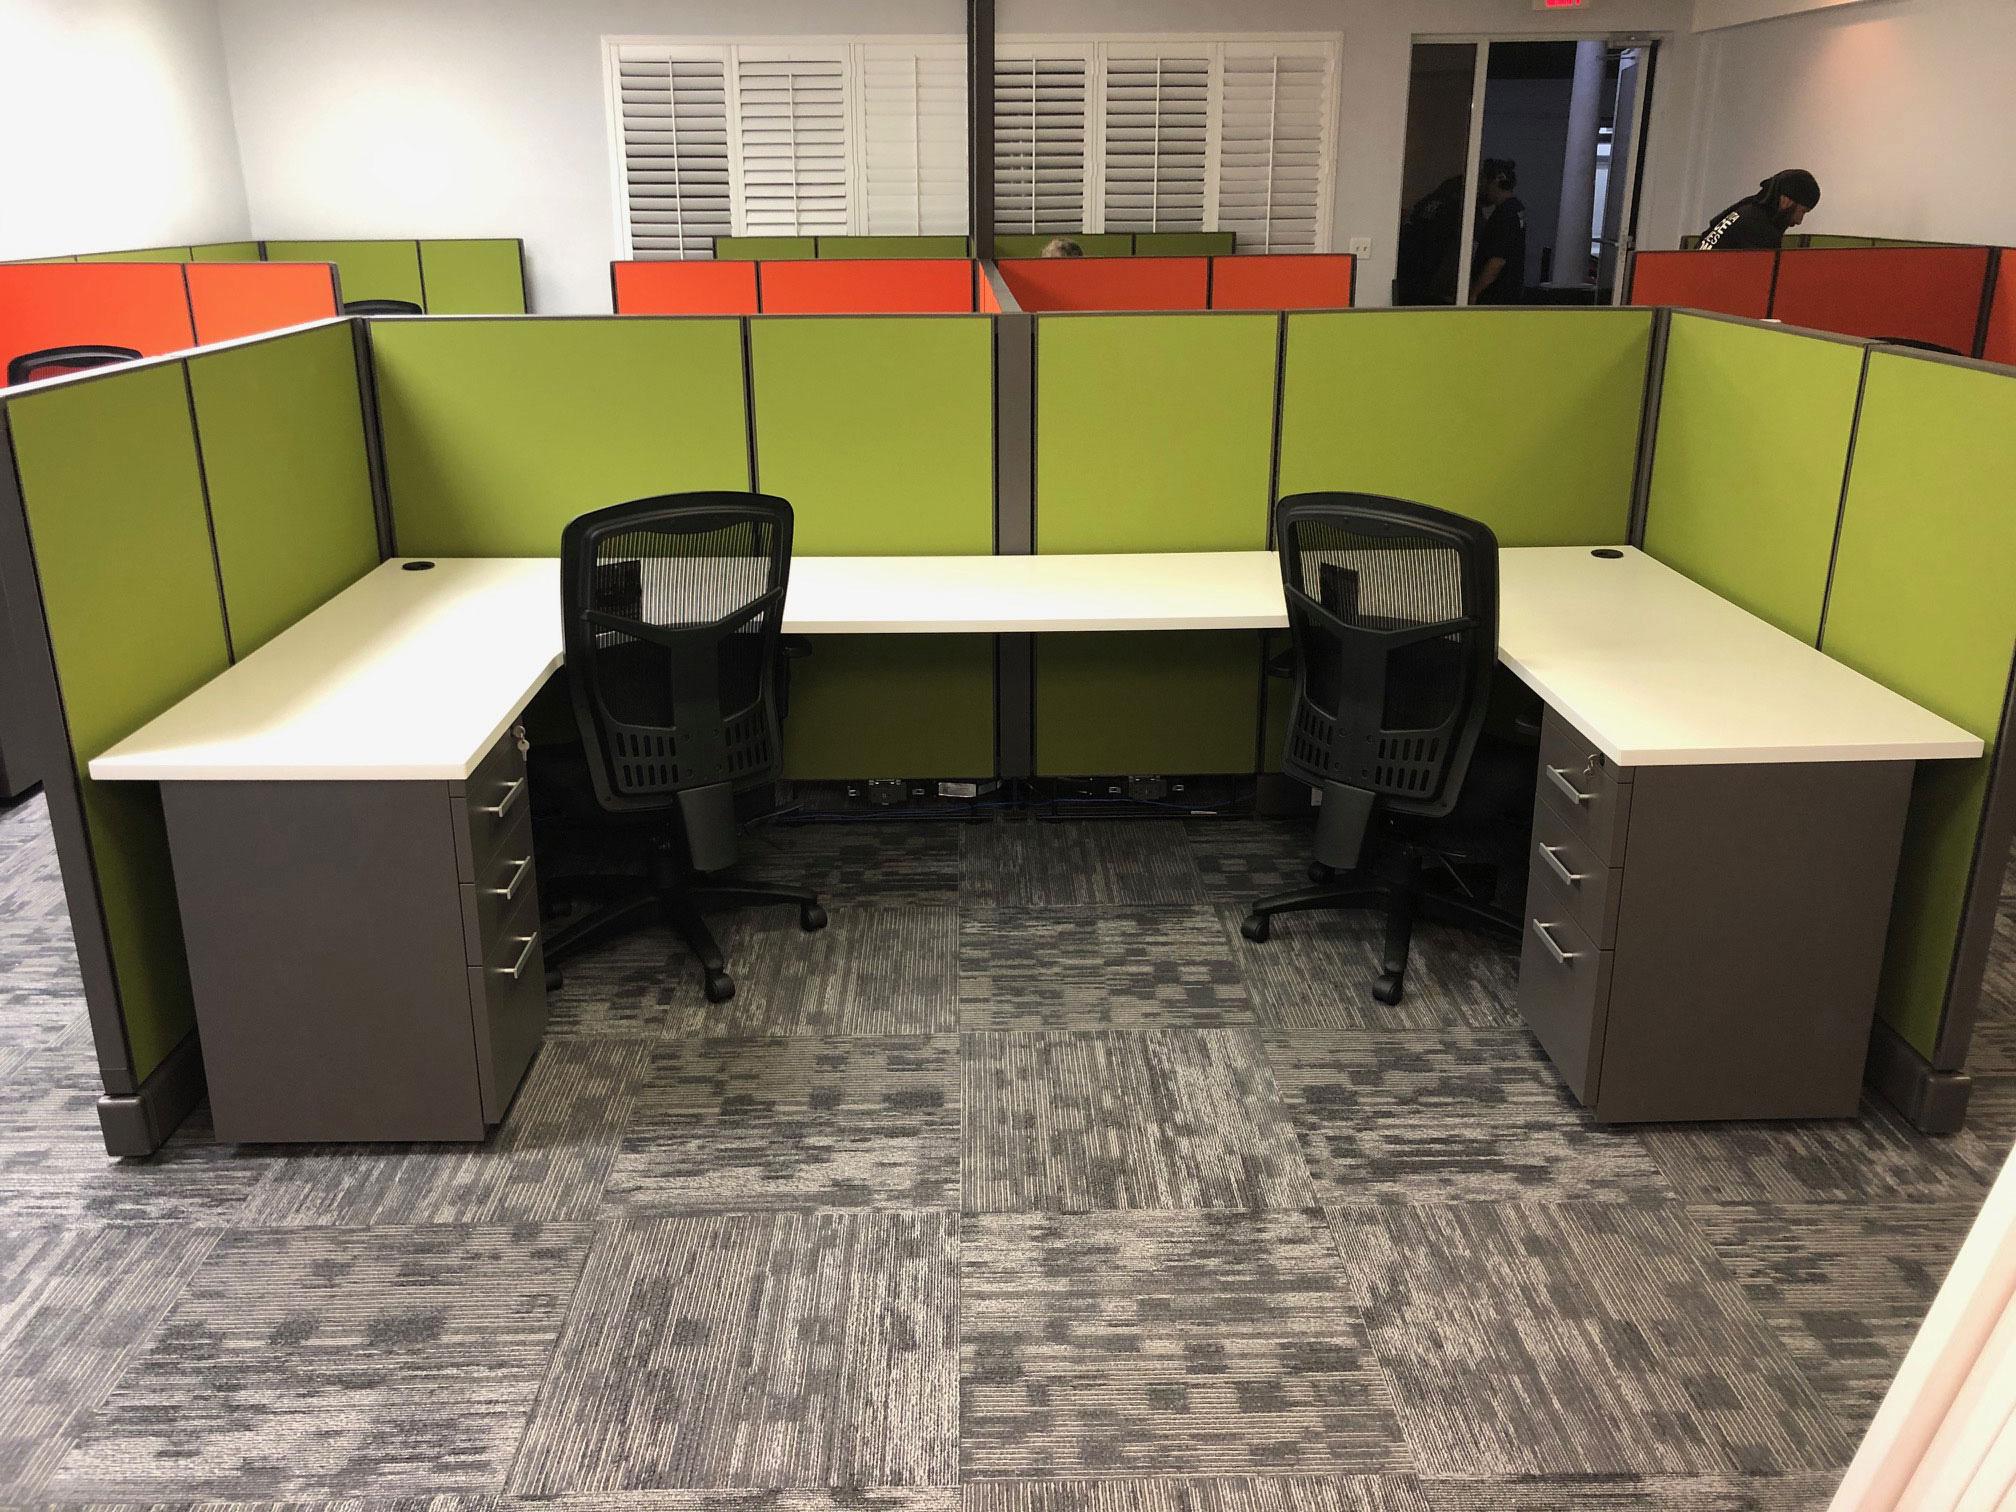 office-cubicles-for-sale-in-leesburg-florida-2.jpg